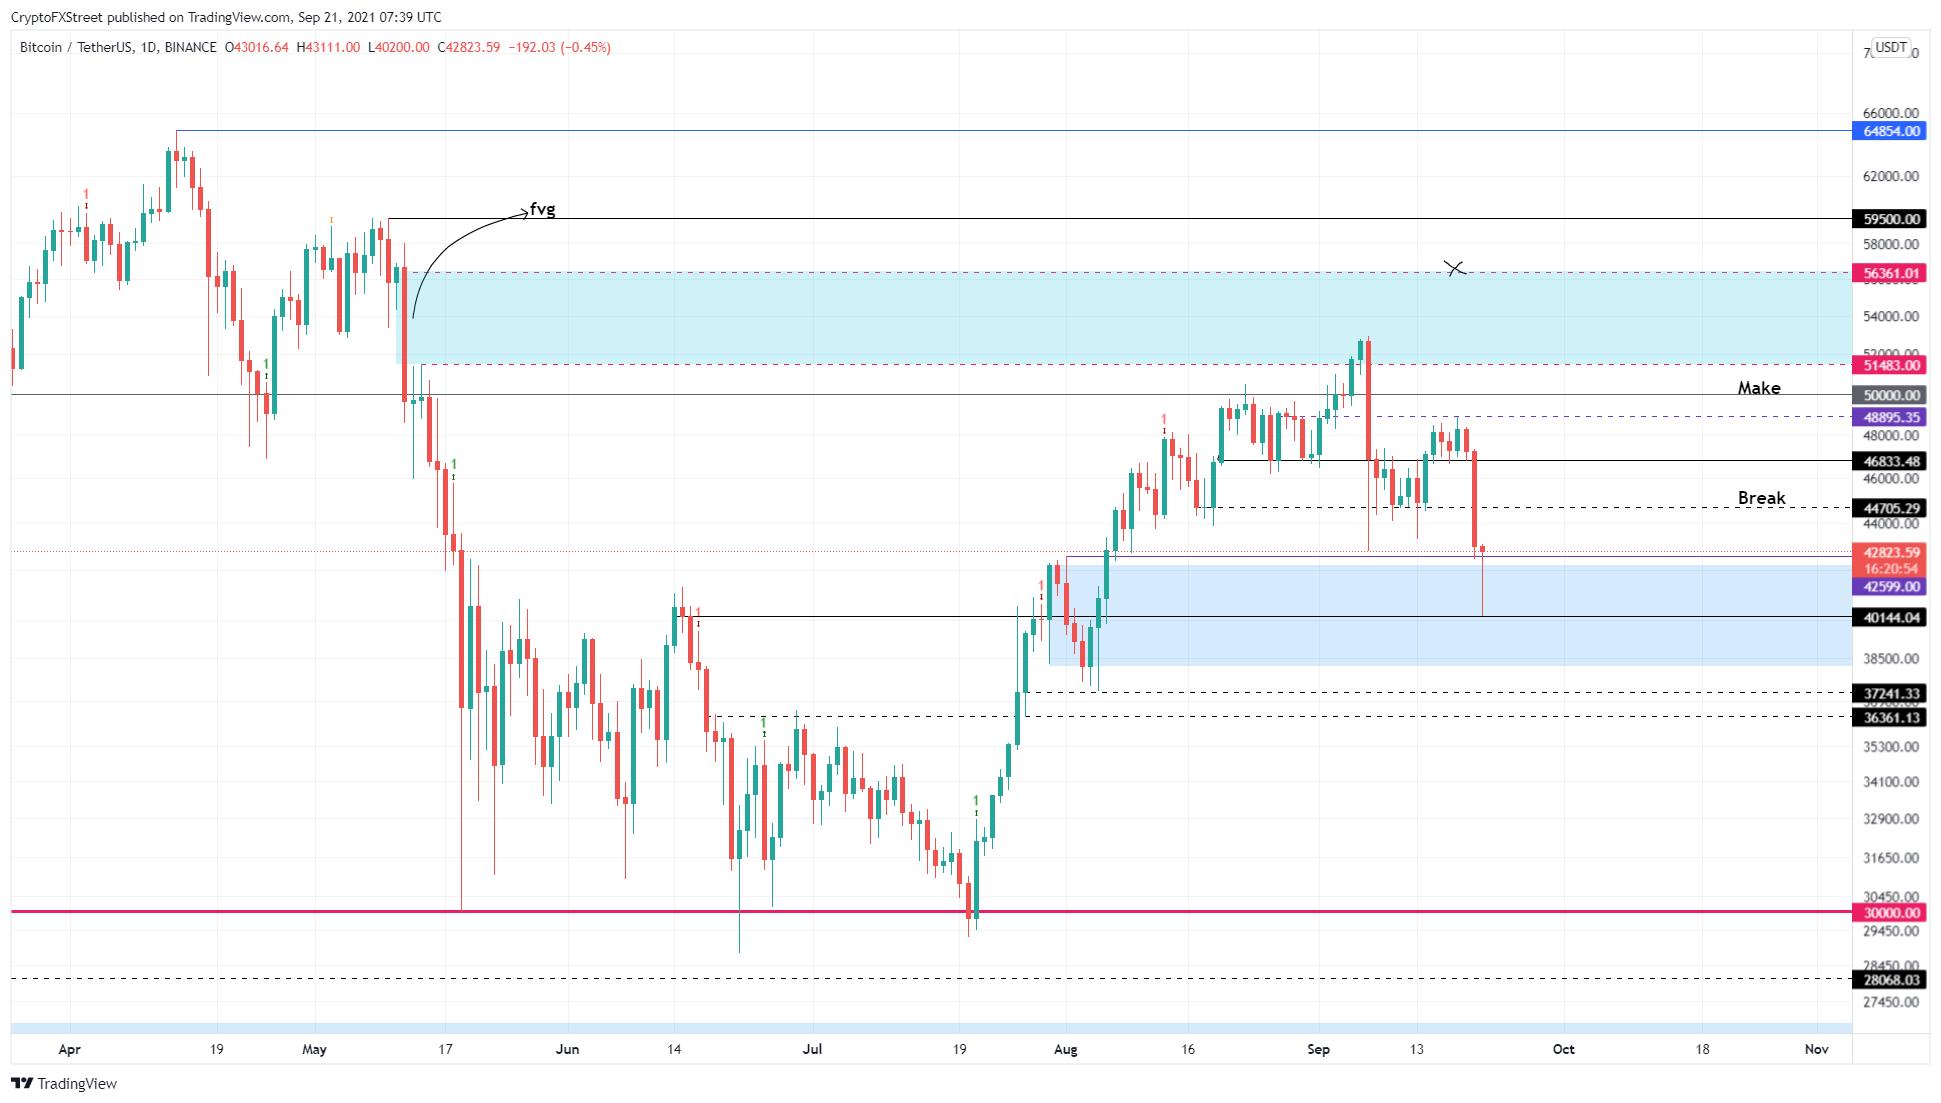 BTC/USDT 1 day chart